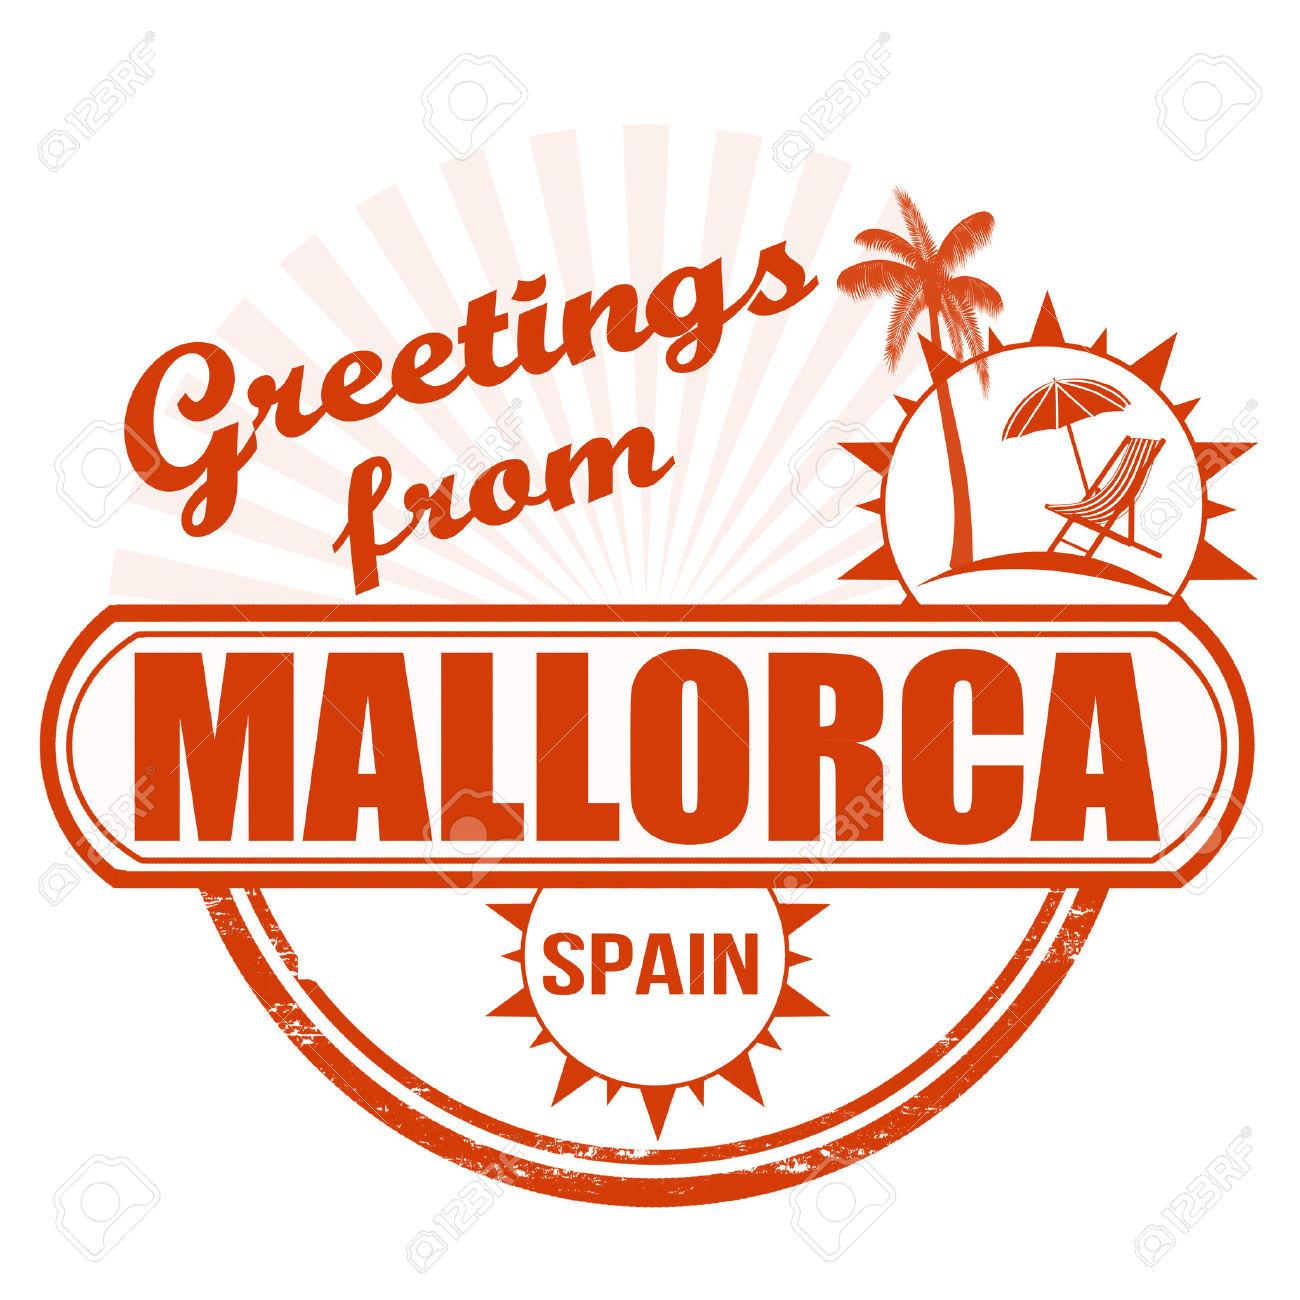 Majorca clipart #15, Download drawings